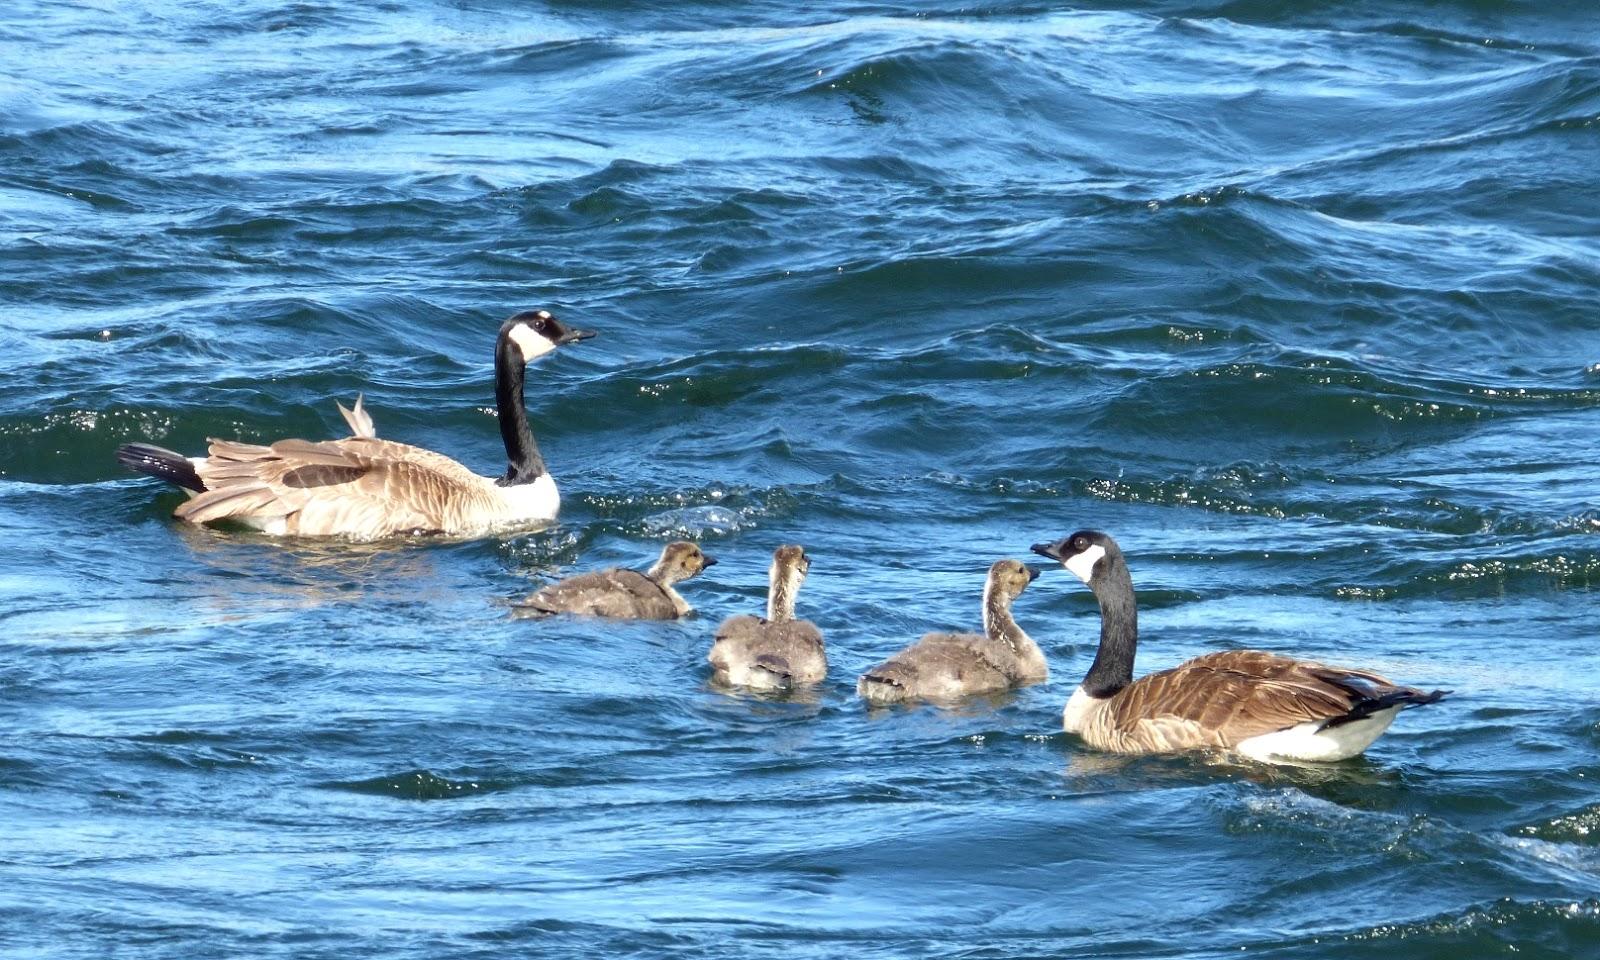 Canada Goose vest outlet store - Geotripper's California Birds: Canada Goose Family in Tuolumne ...